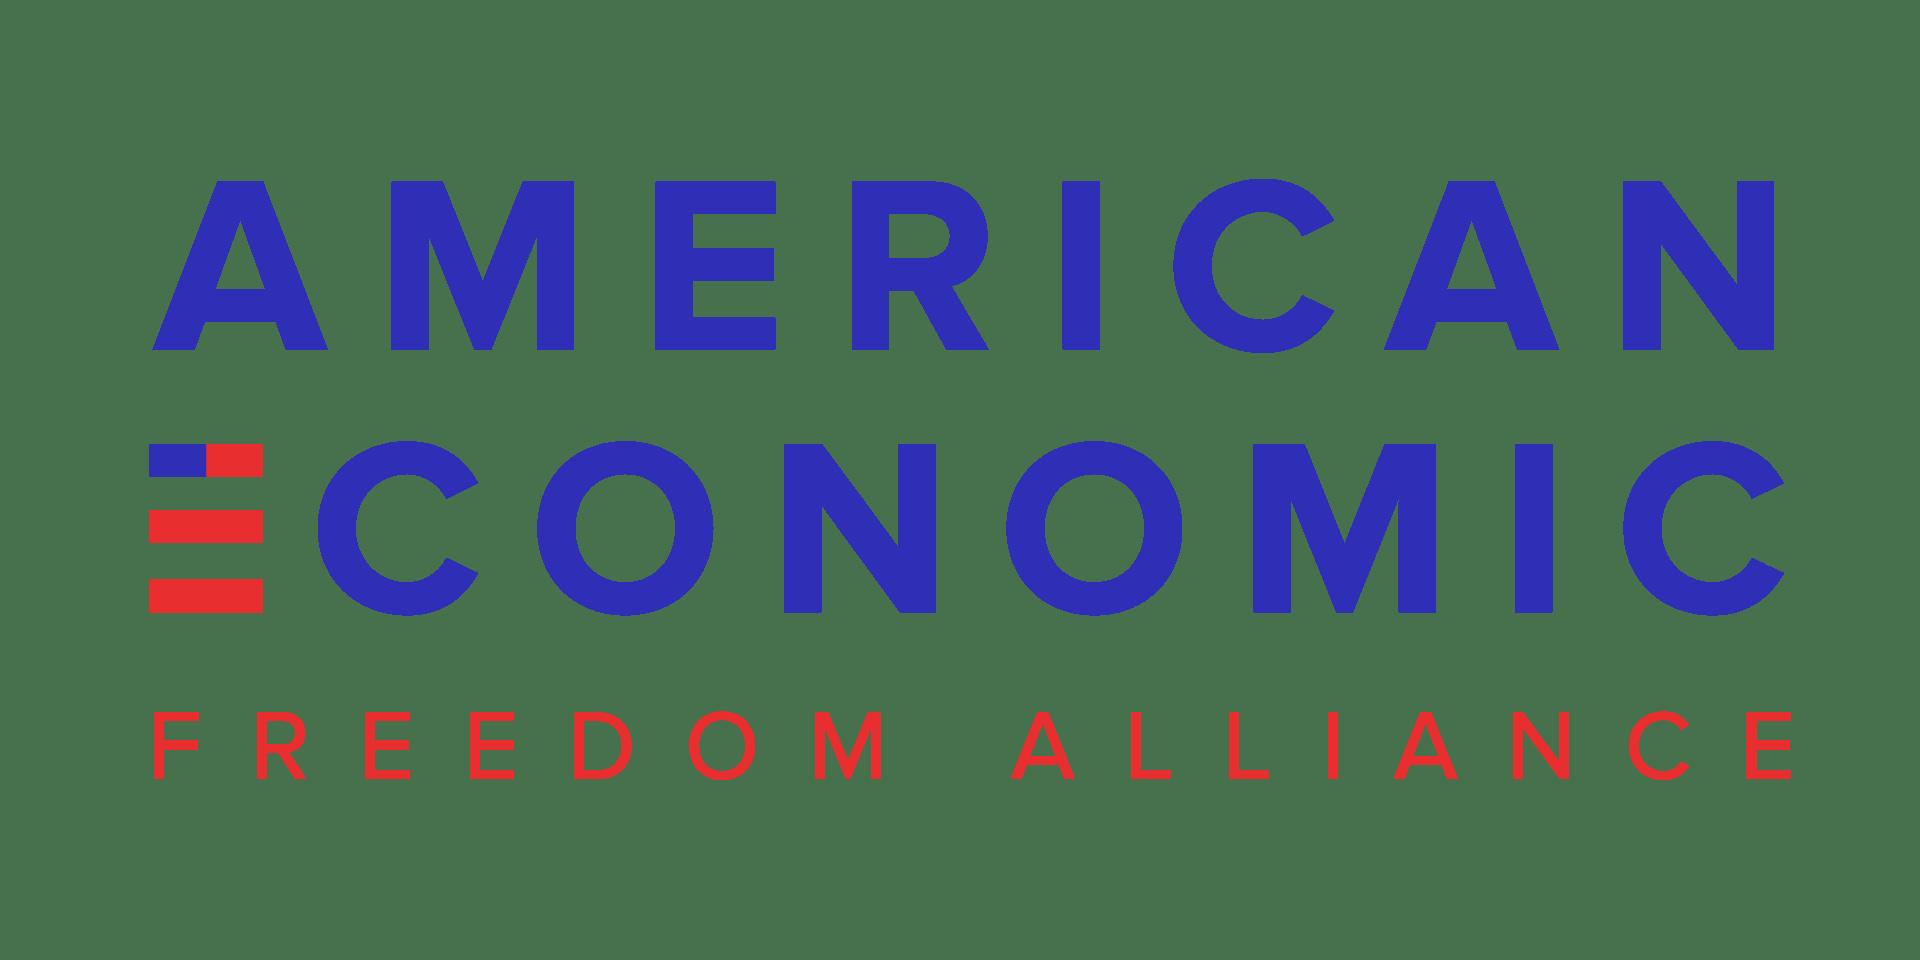 Aefa logo color